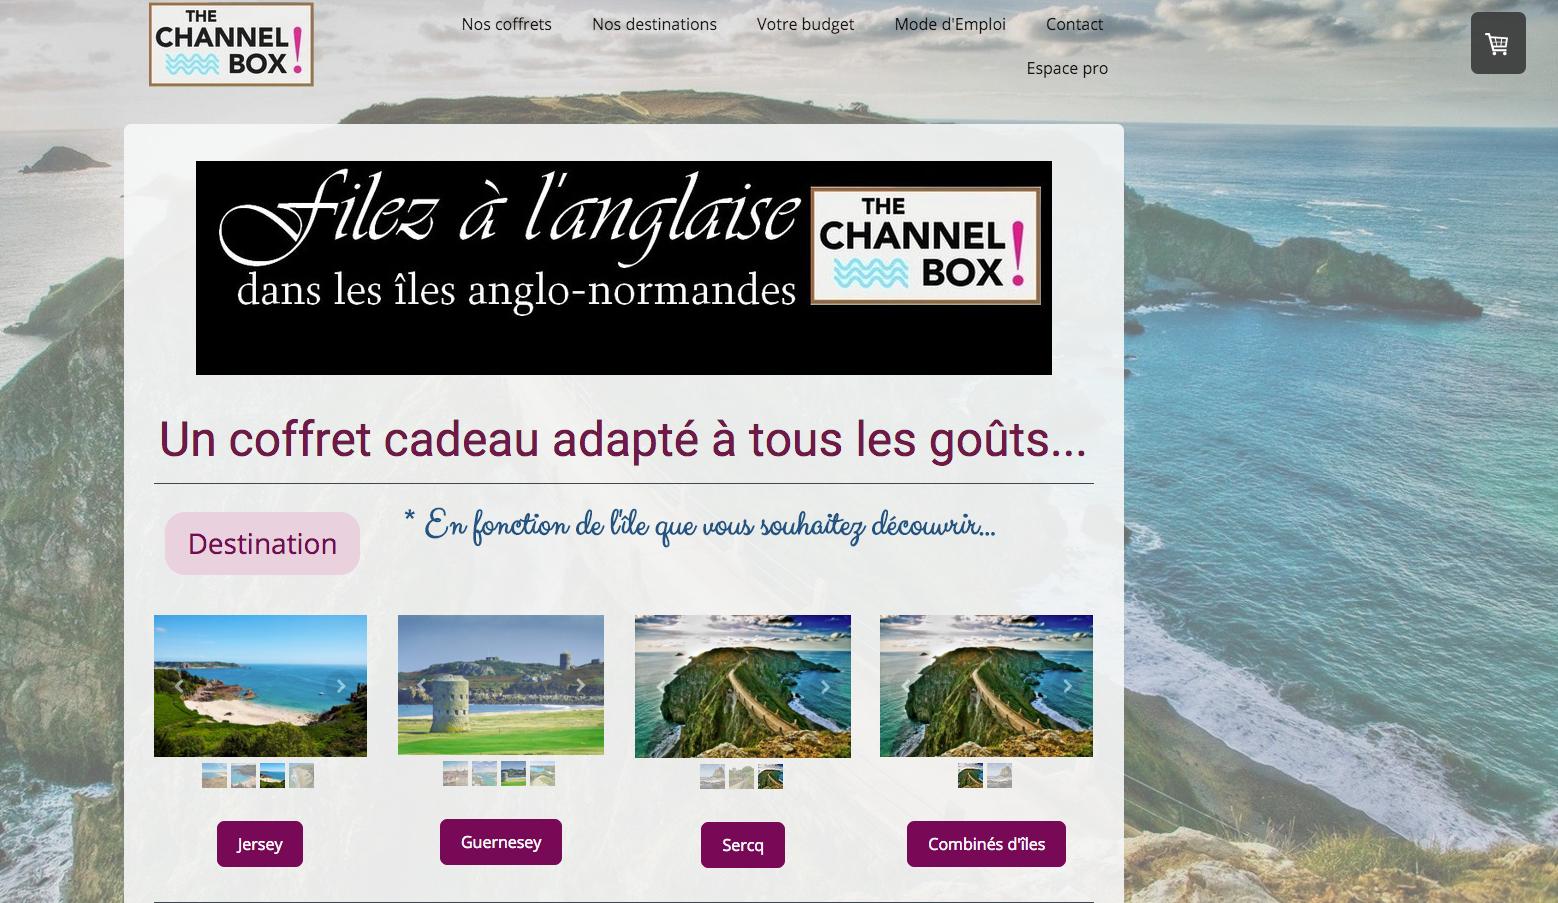 http://www.thechannelbox.fr/